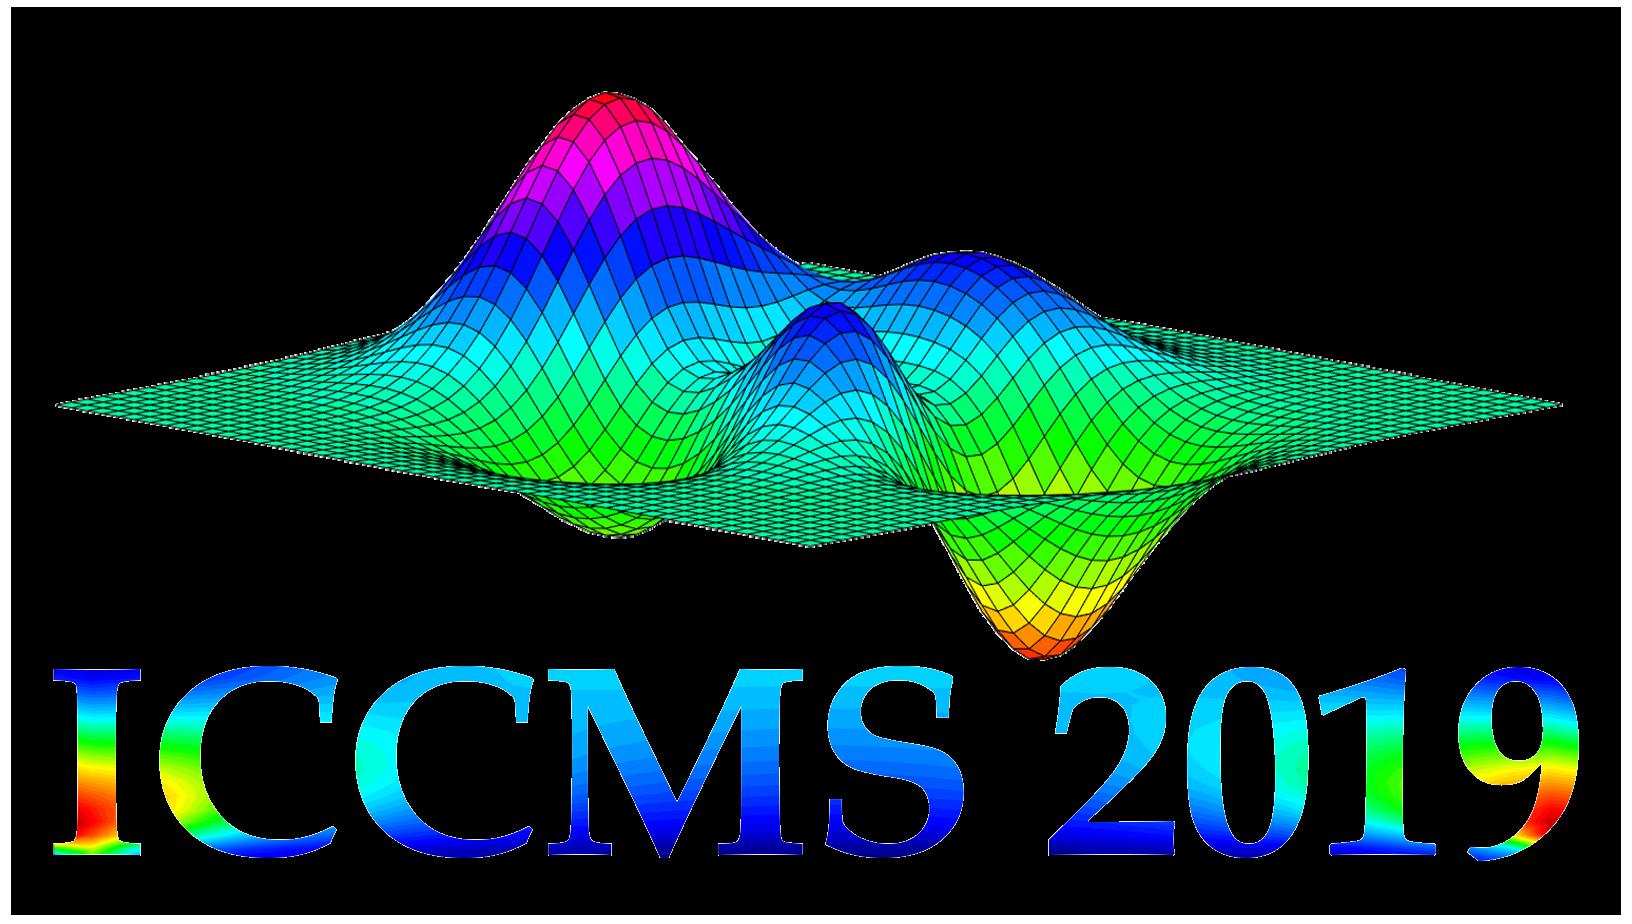 ICCMS 2019